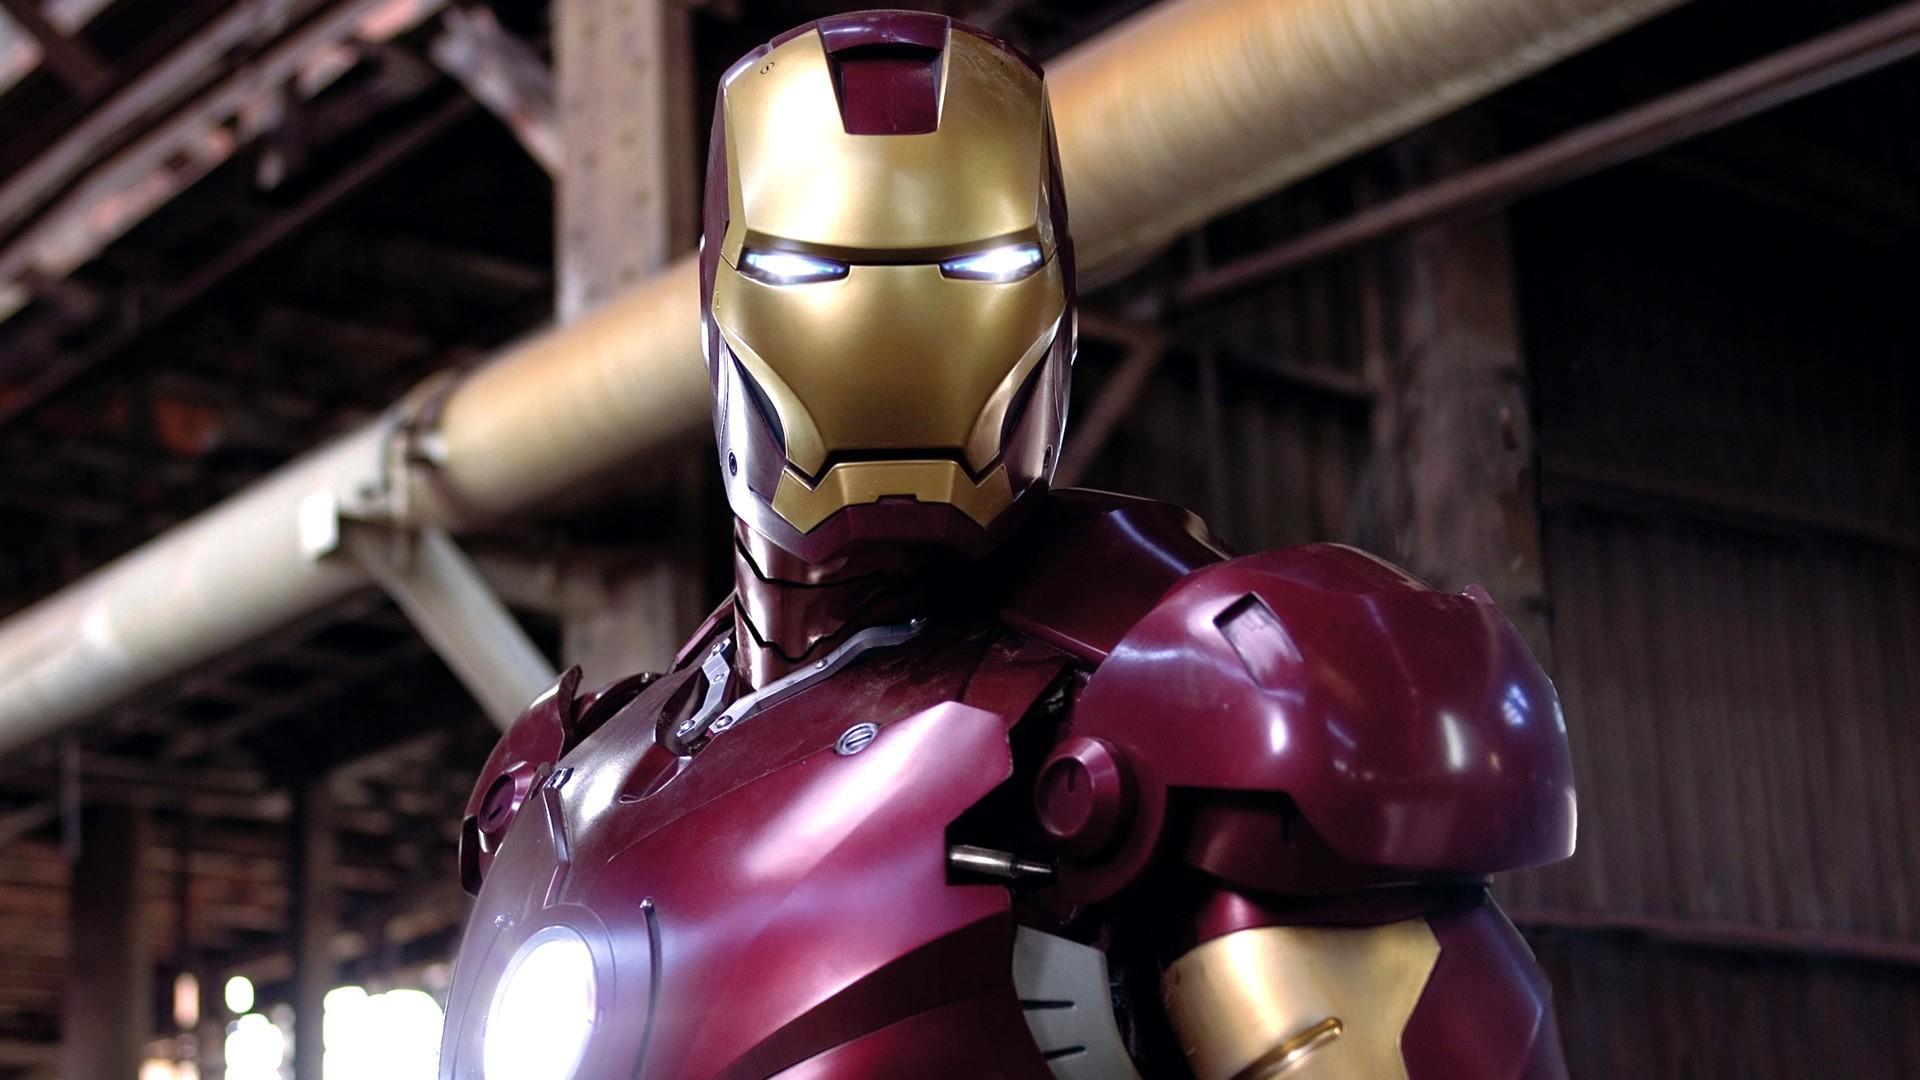 Hintergrundbilder Filme Superheld Ironman Iron Man 3